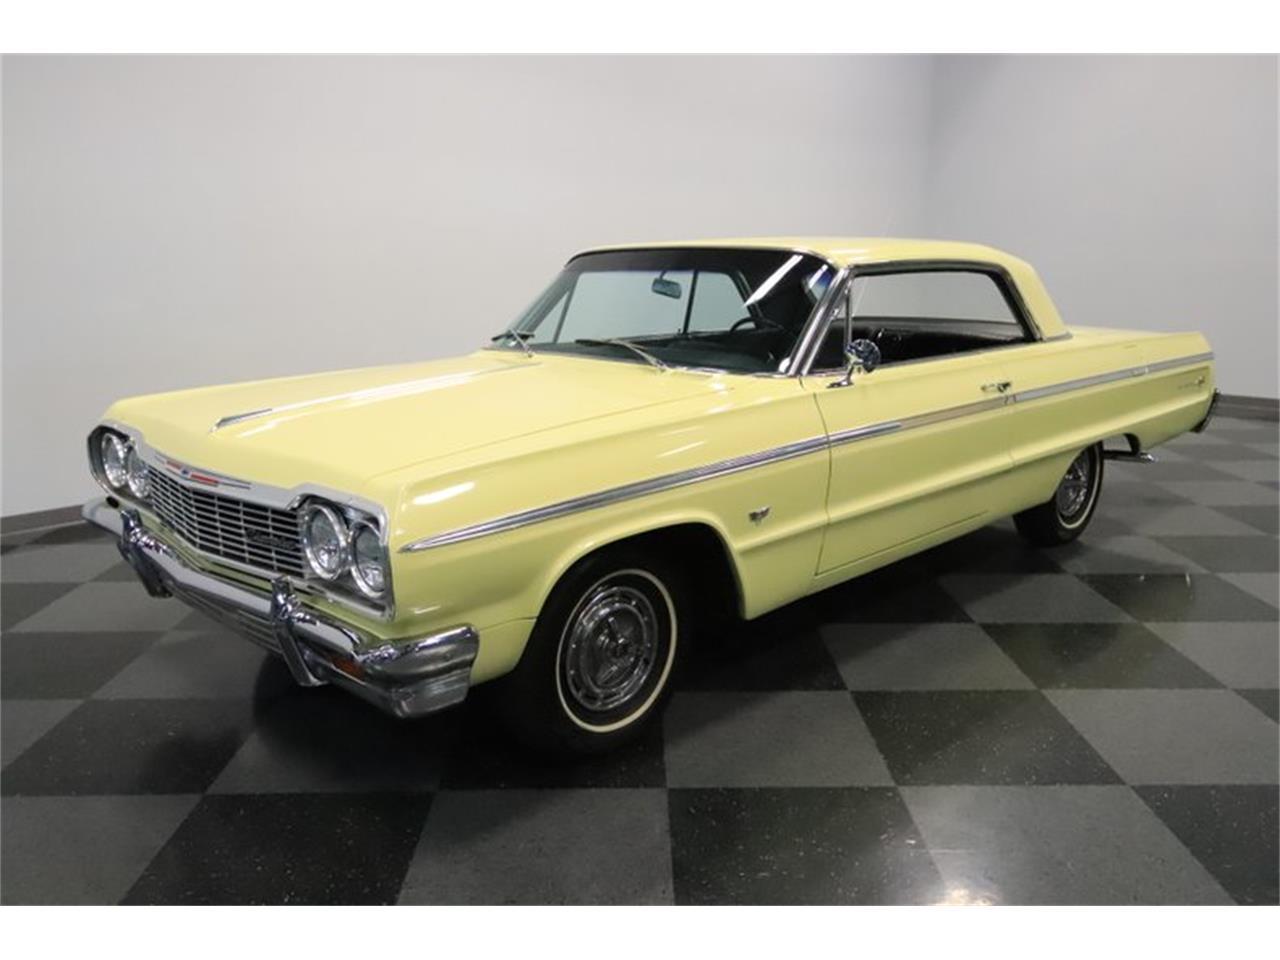 1964 Chevrolet Impala (CC-1241234) for sale in Mesa, Arizona